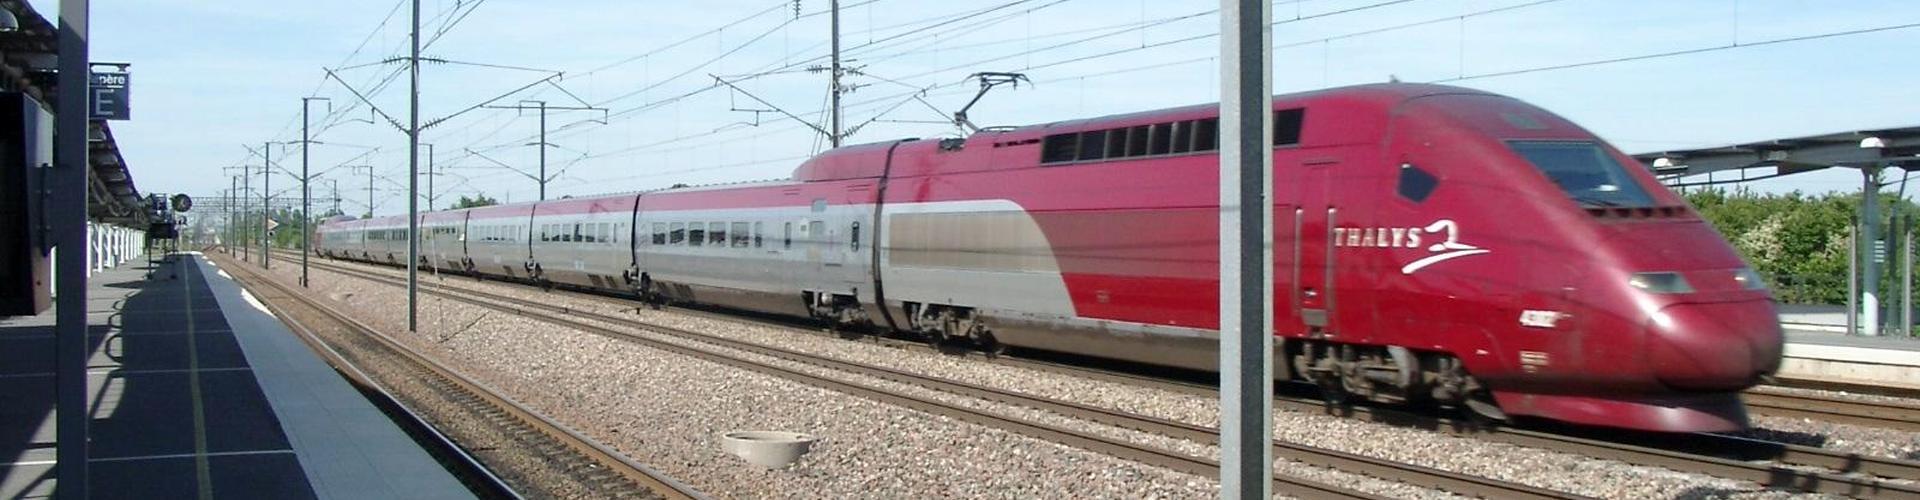 SNCF Fahrplan